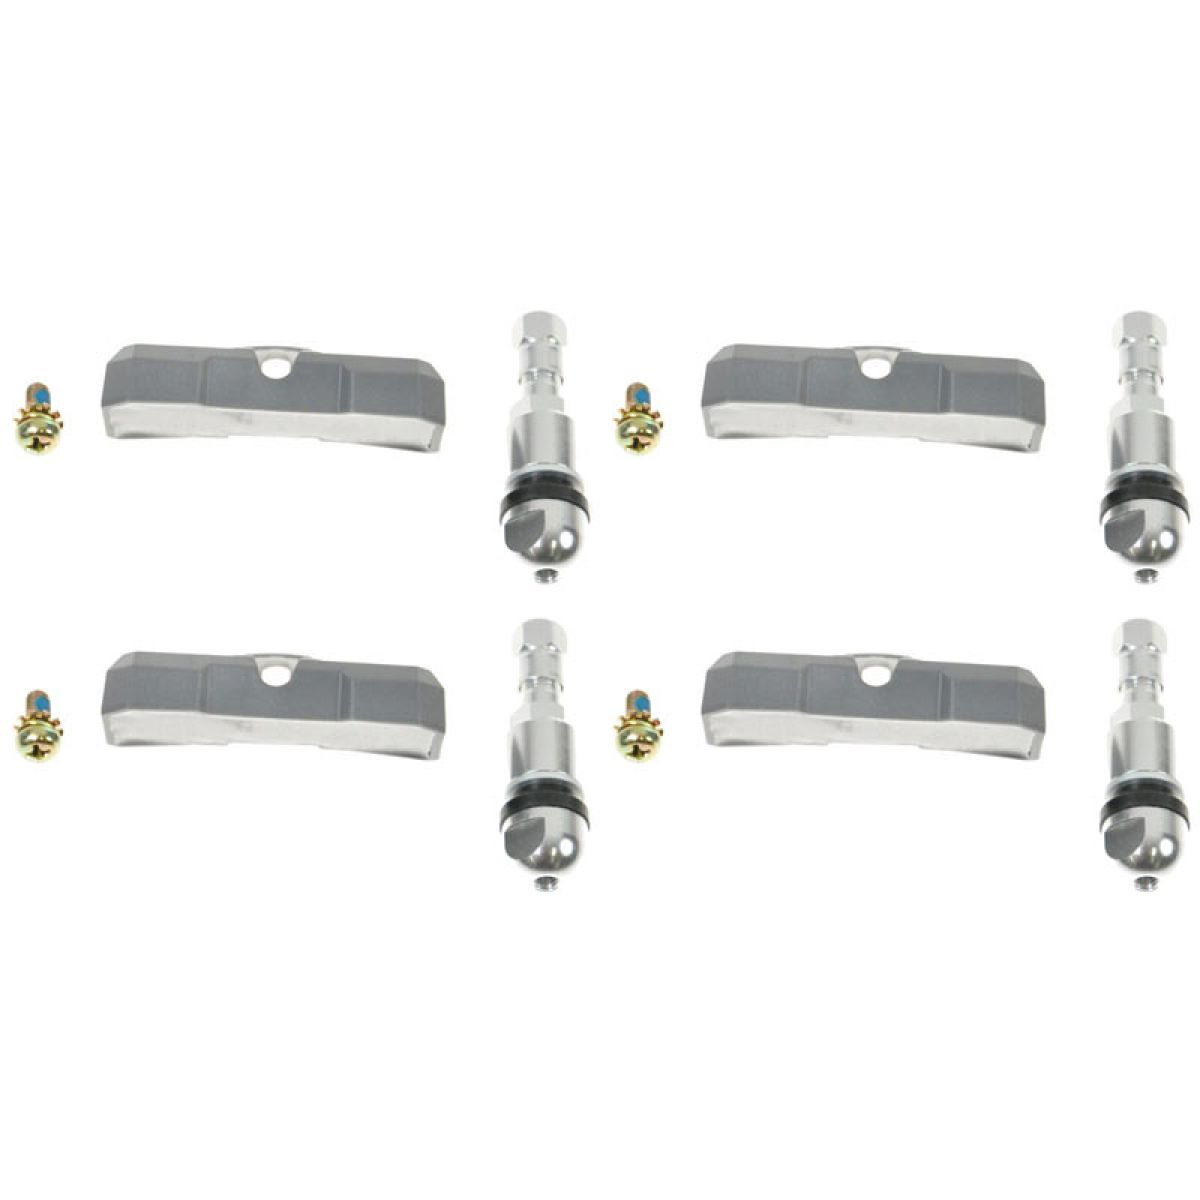 Dorman Tire Pressure Monitor Sensor TPMS Set Of 4 Kit For